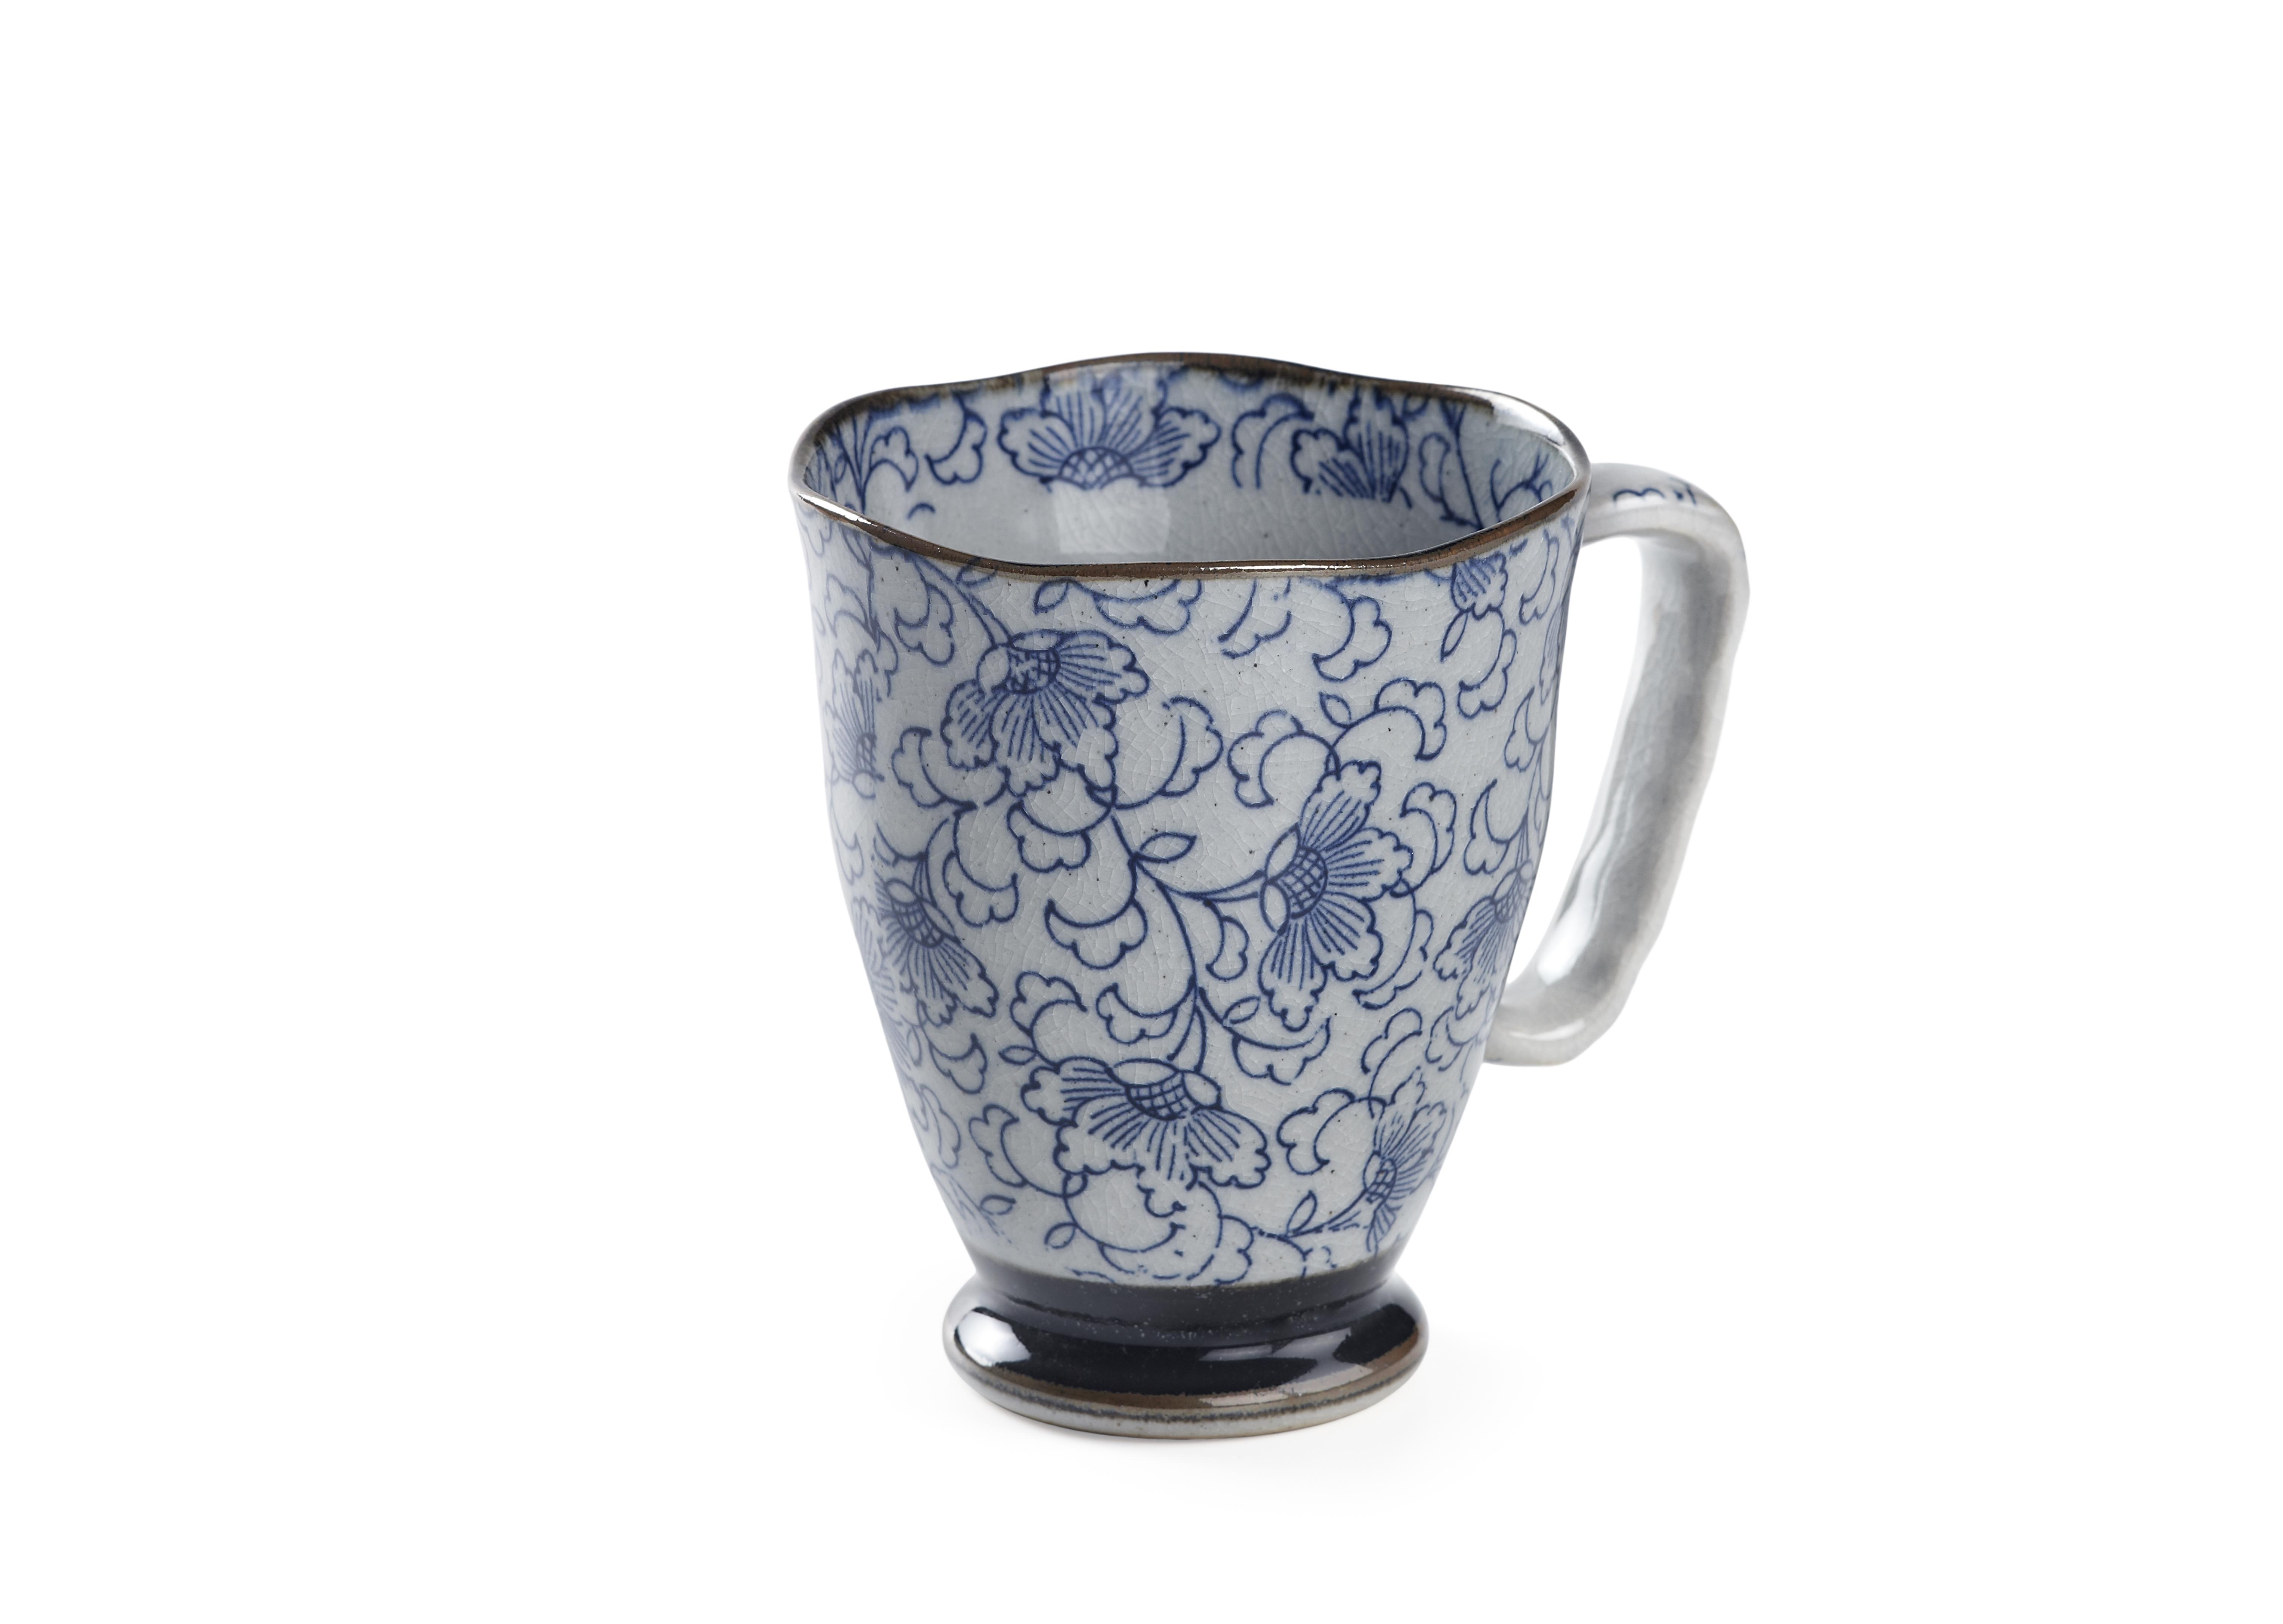 Mug Uki Kiku Blu. Tazze in porcellana. Tea Shop®